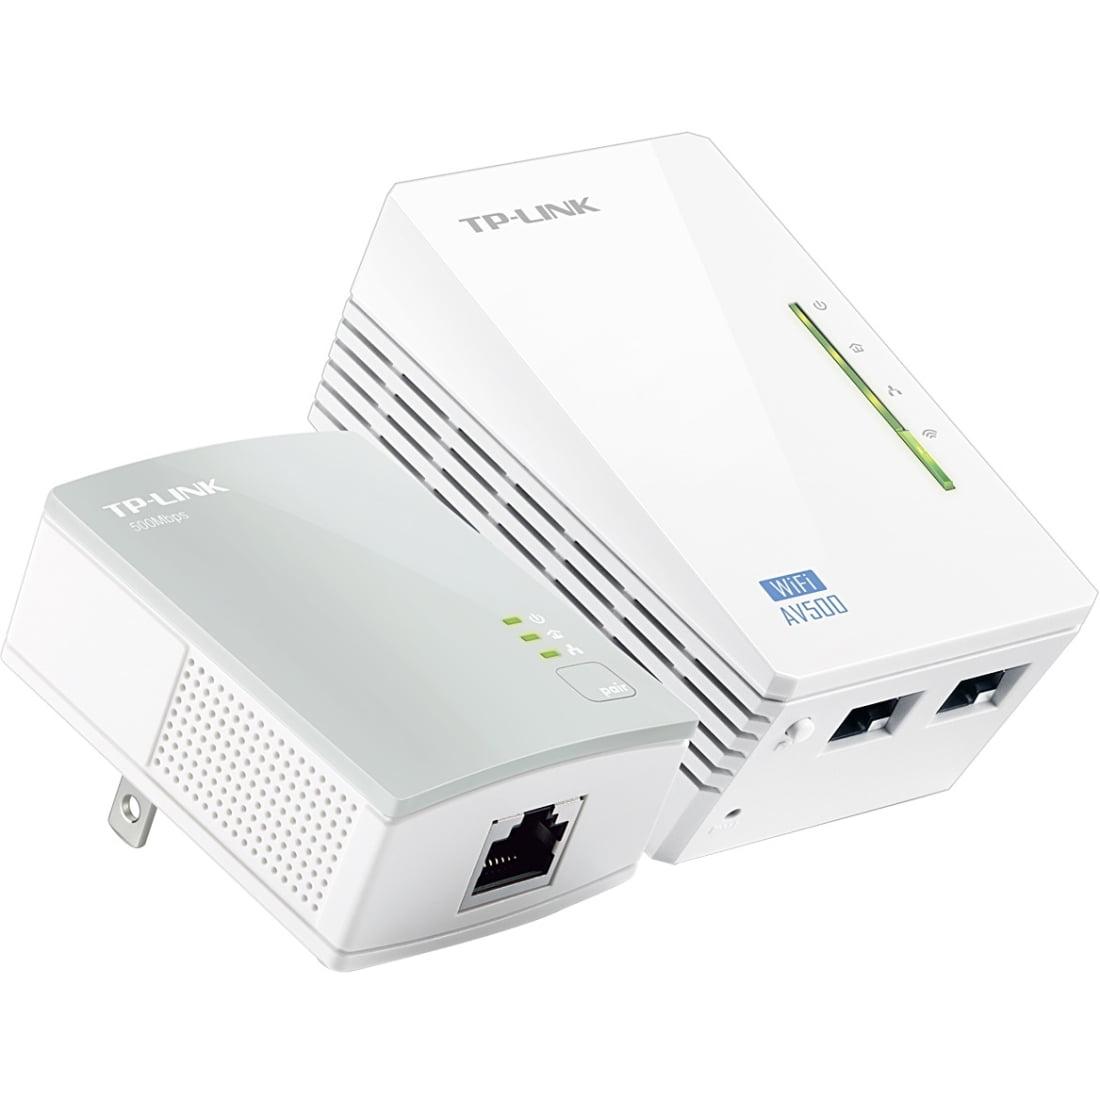 TP-LINK TL-WPA4220KIT ADVANCED 300Mbps Universal Wi-Fi Range (Refurbished)